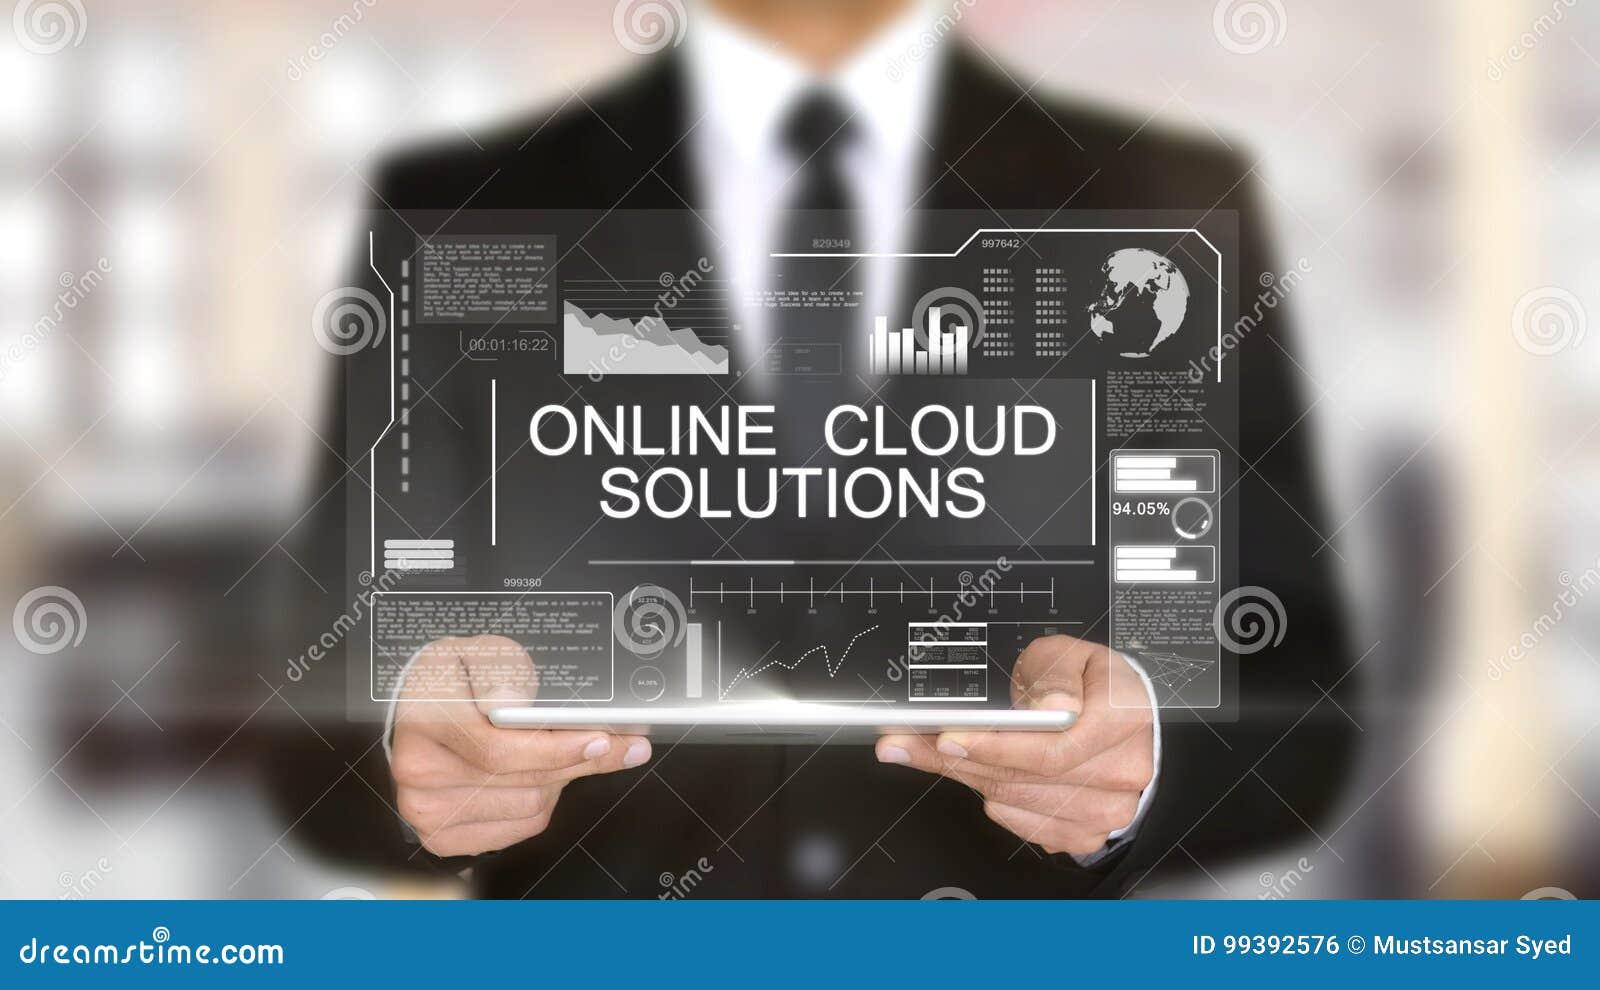 Online Cloud Solutions, Hologram Futuristic Interface Concept